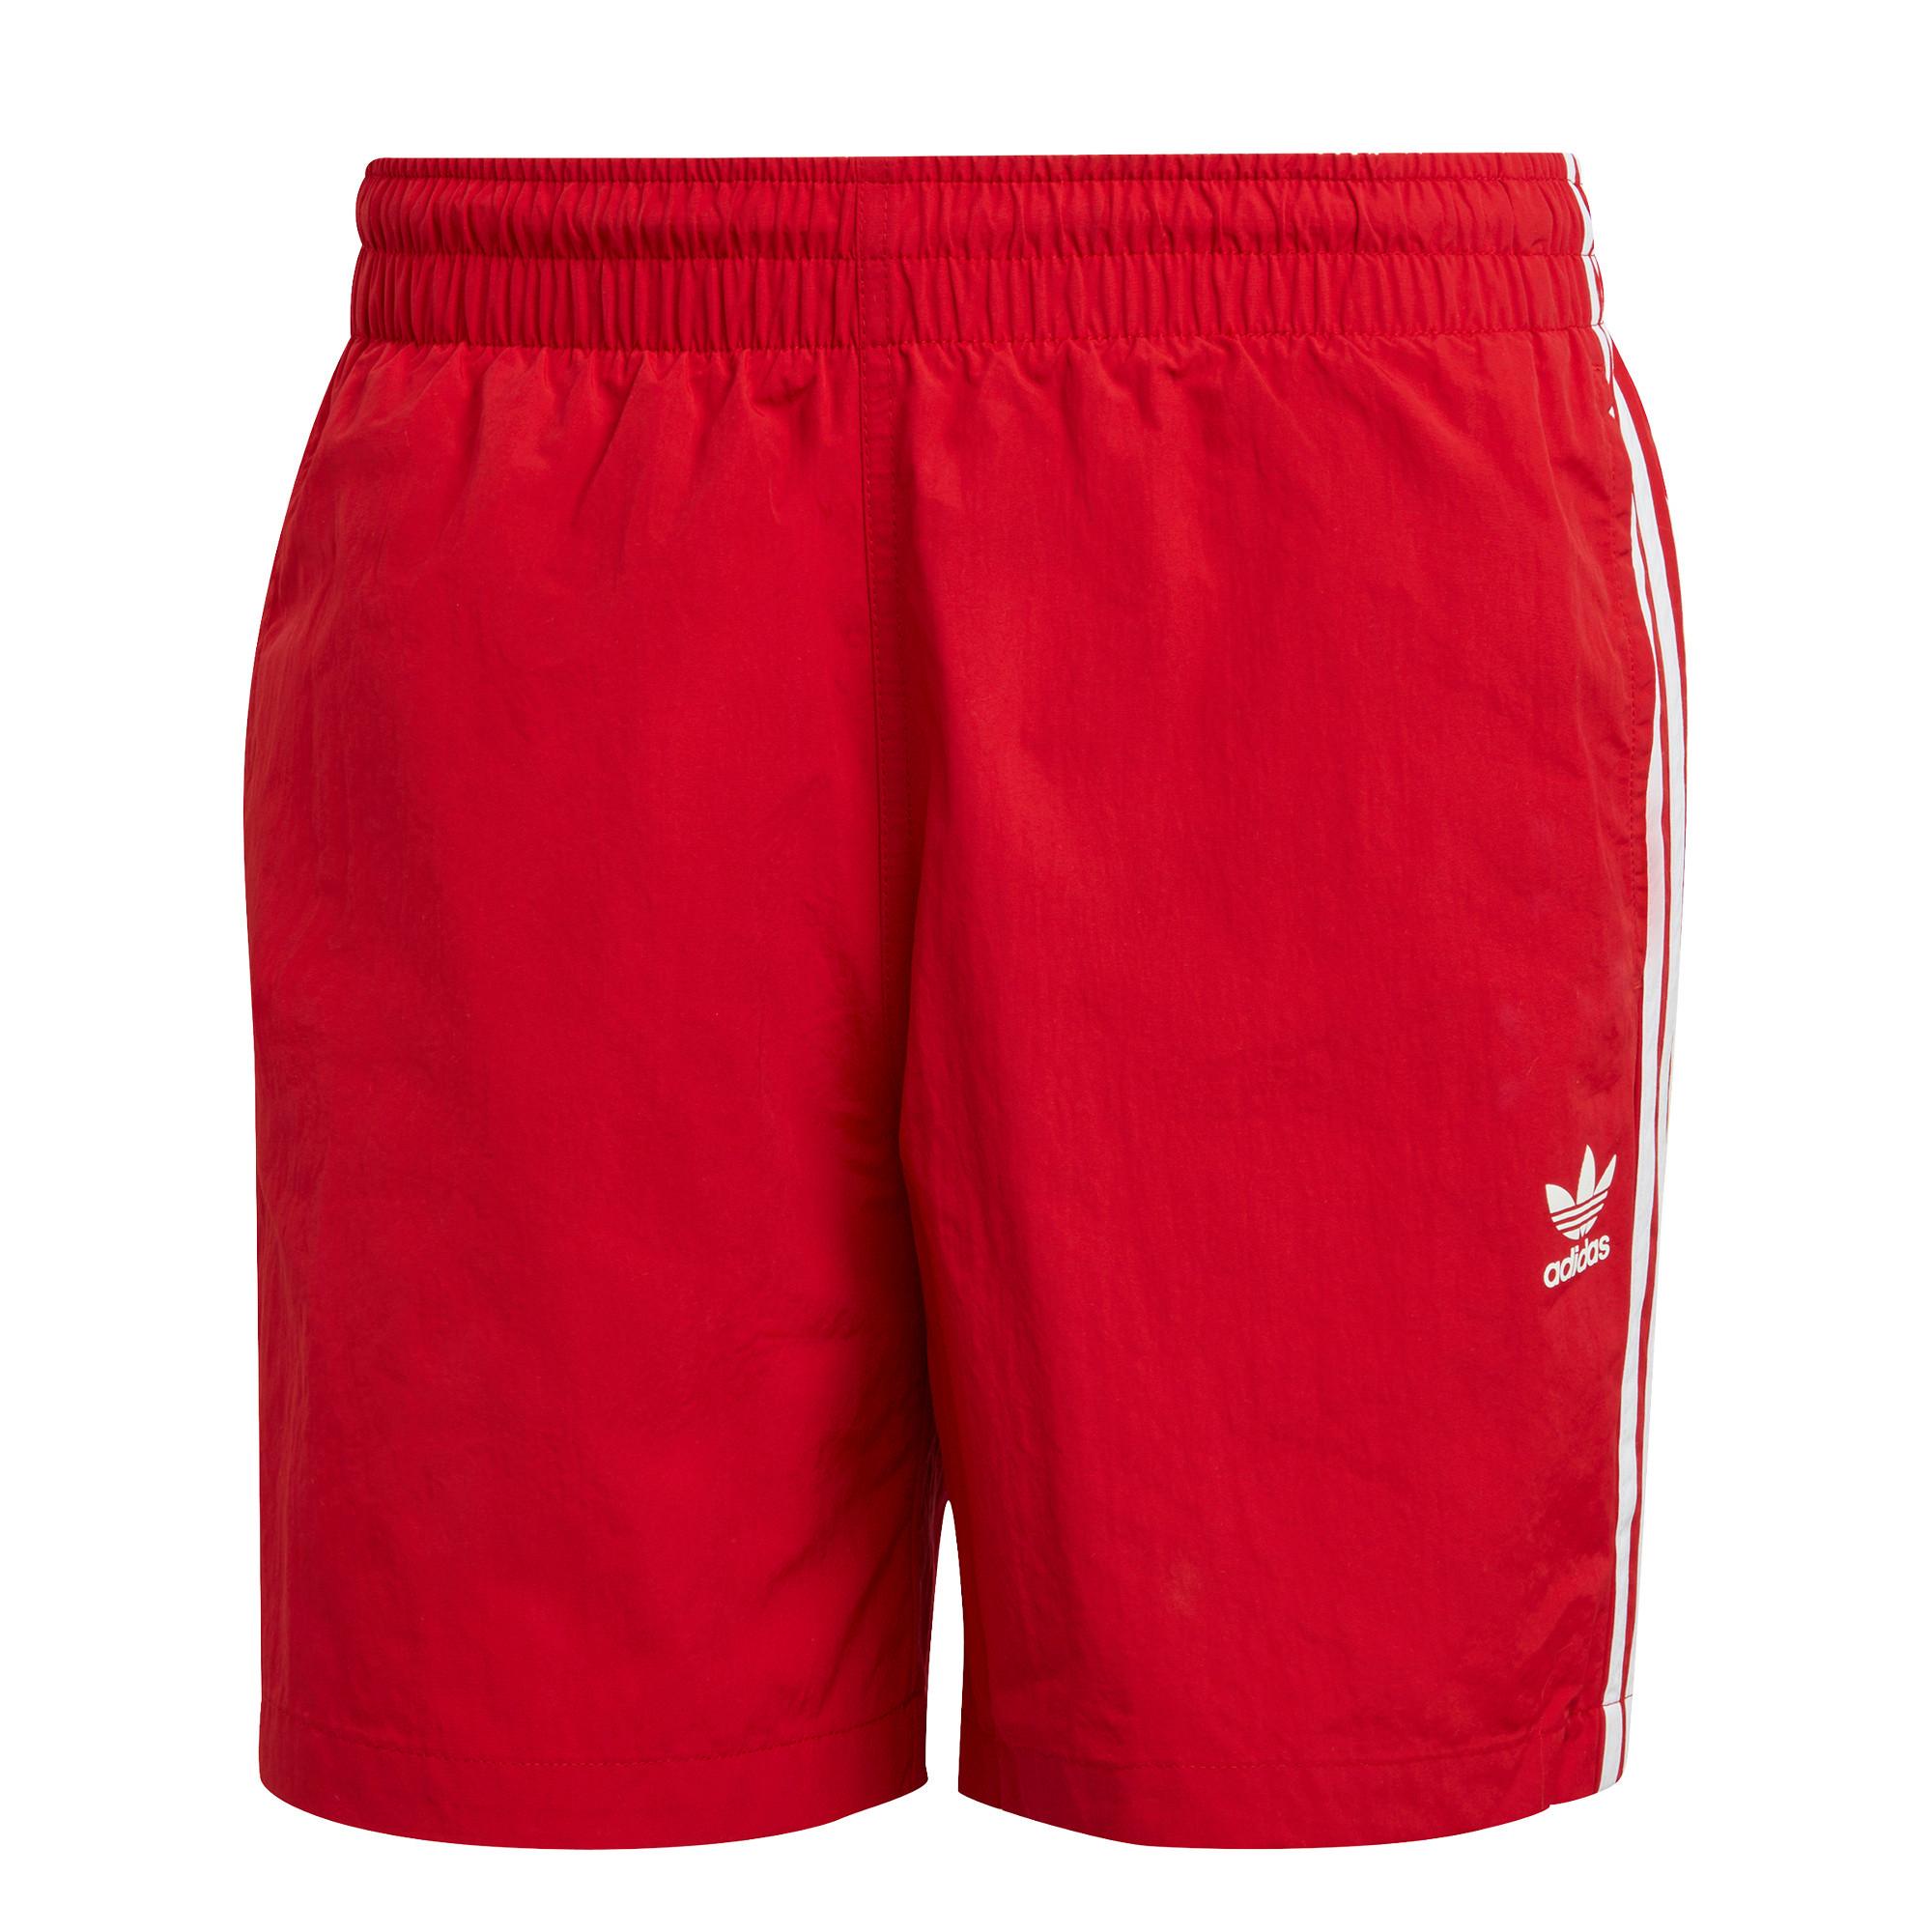 Short da nuoto adicolor classics 3-stripes, Rosso, large image number 0